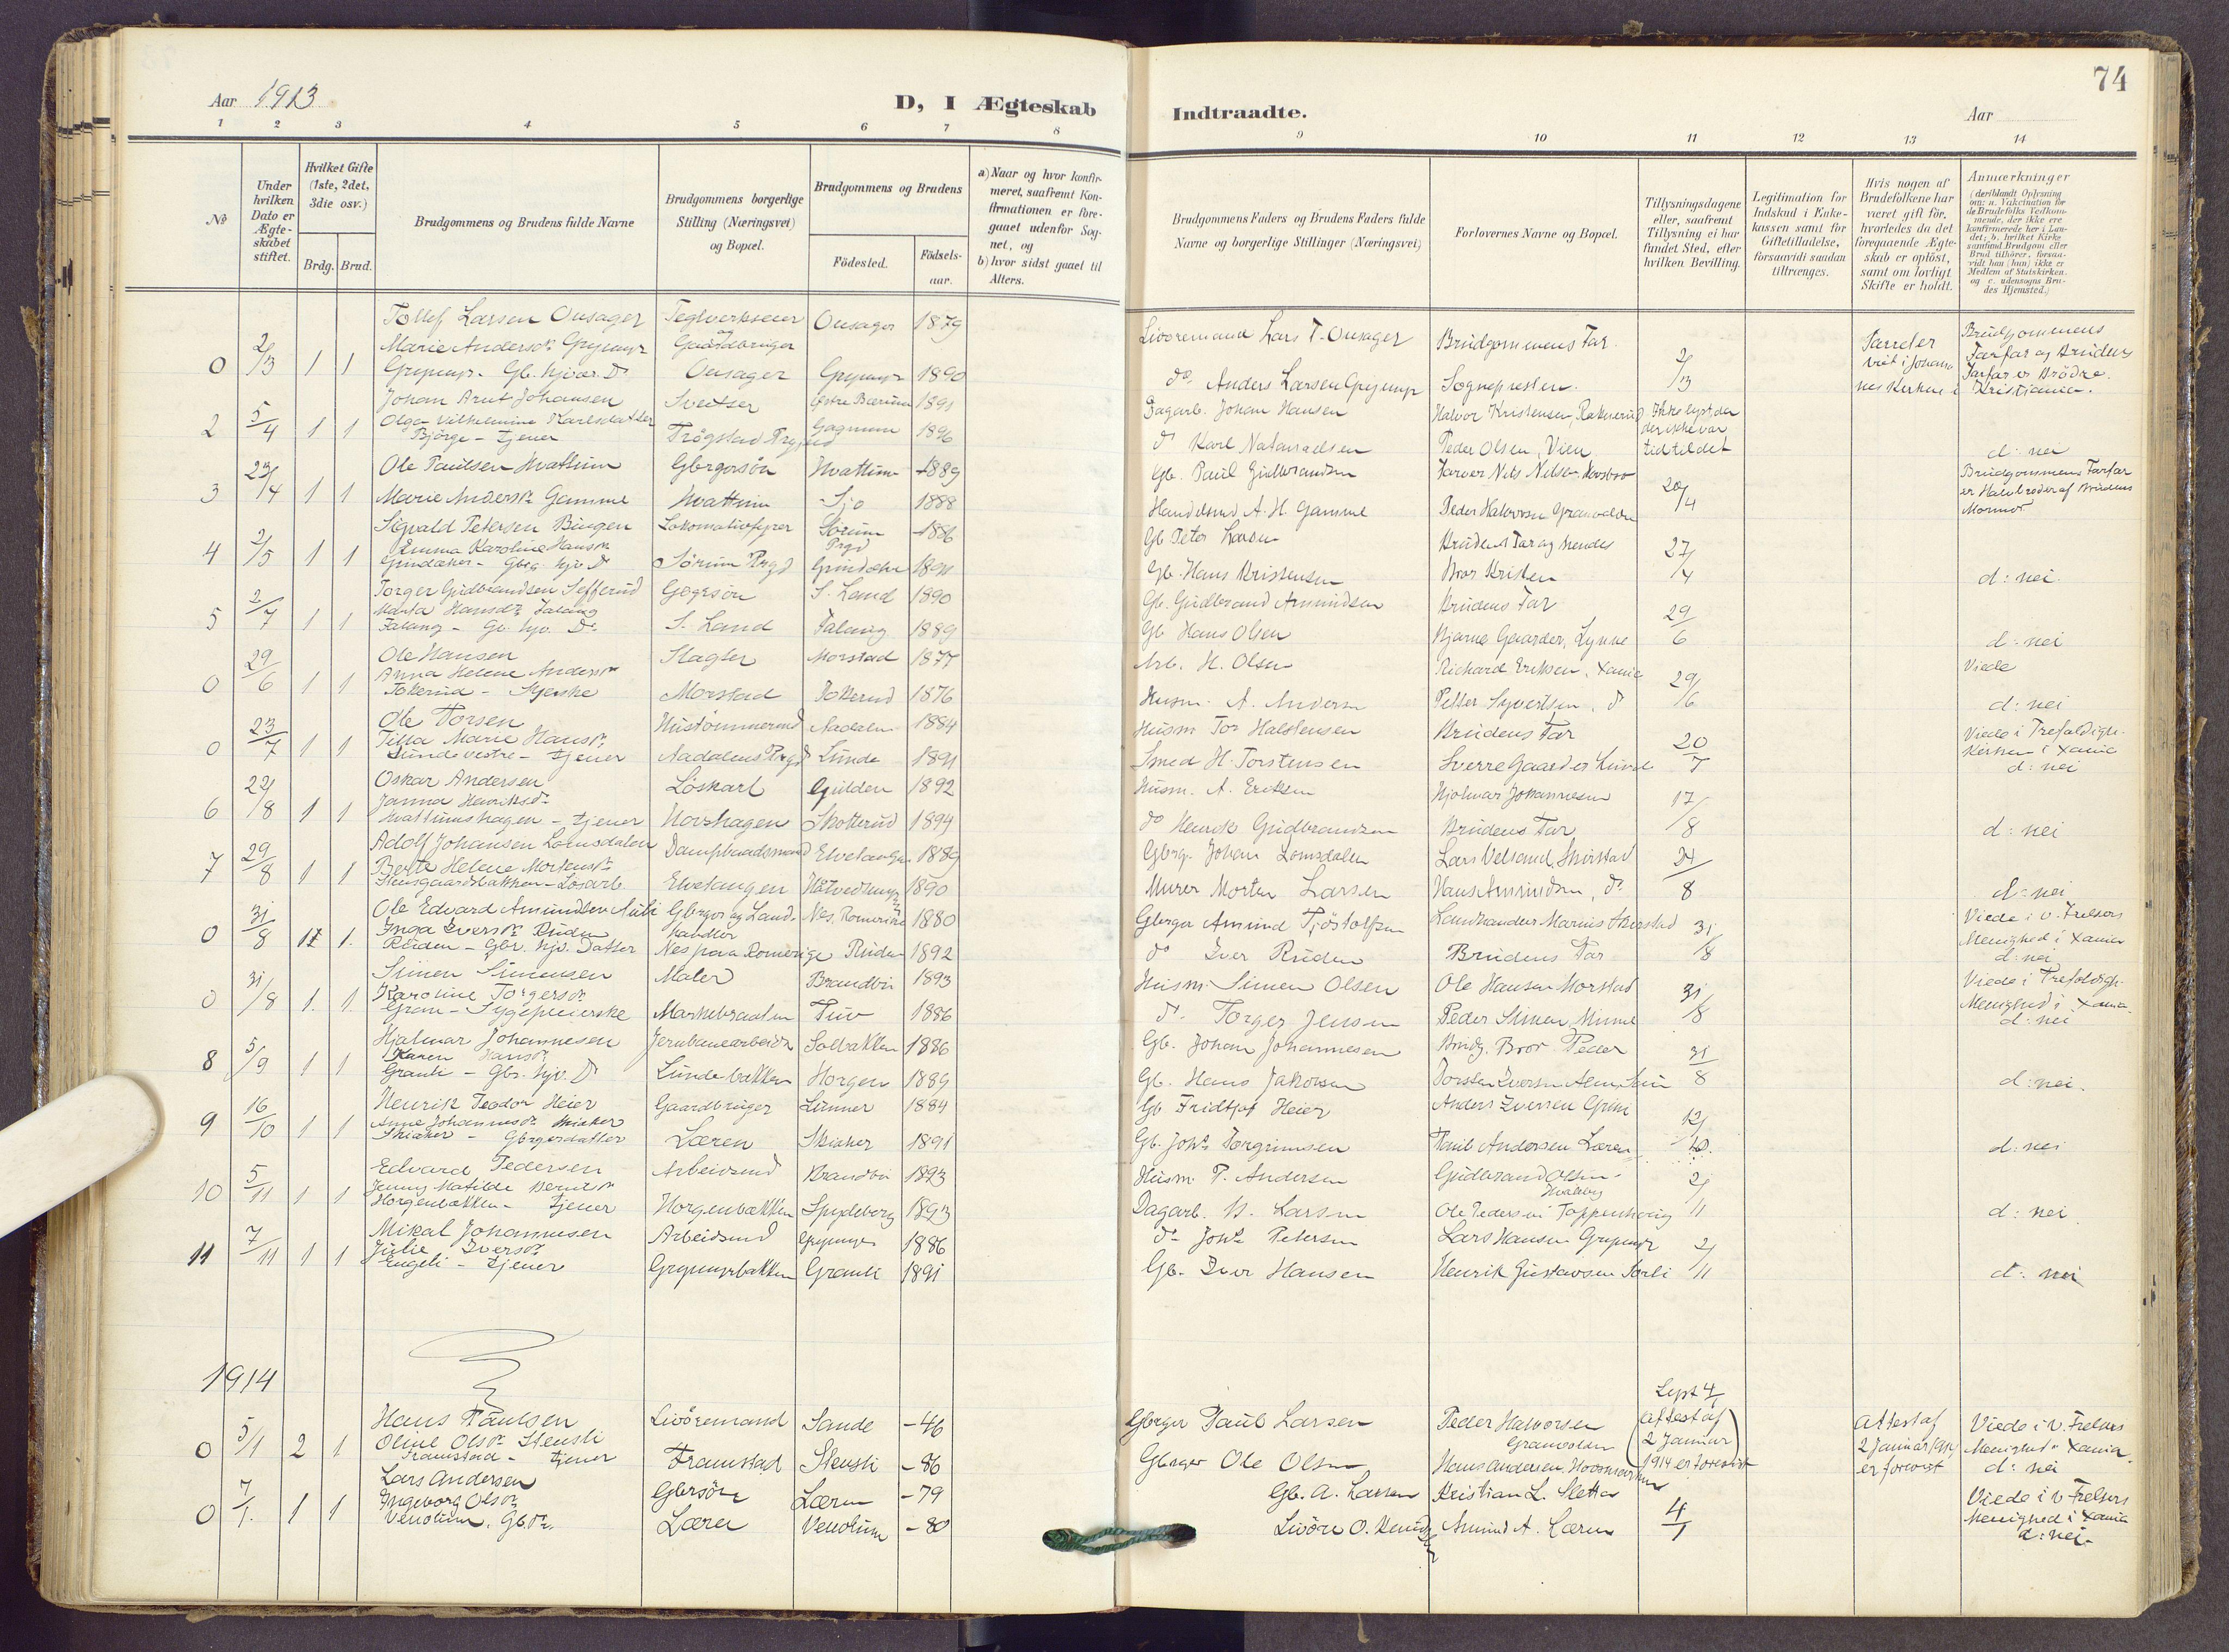 SAH, Gran prestekontor, Ministerialbok nr. 22, 1908-1918, s. 74